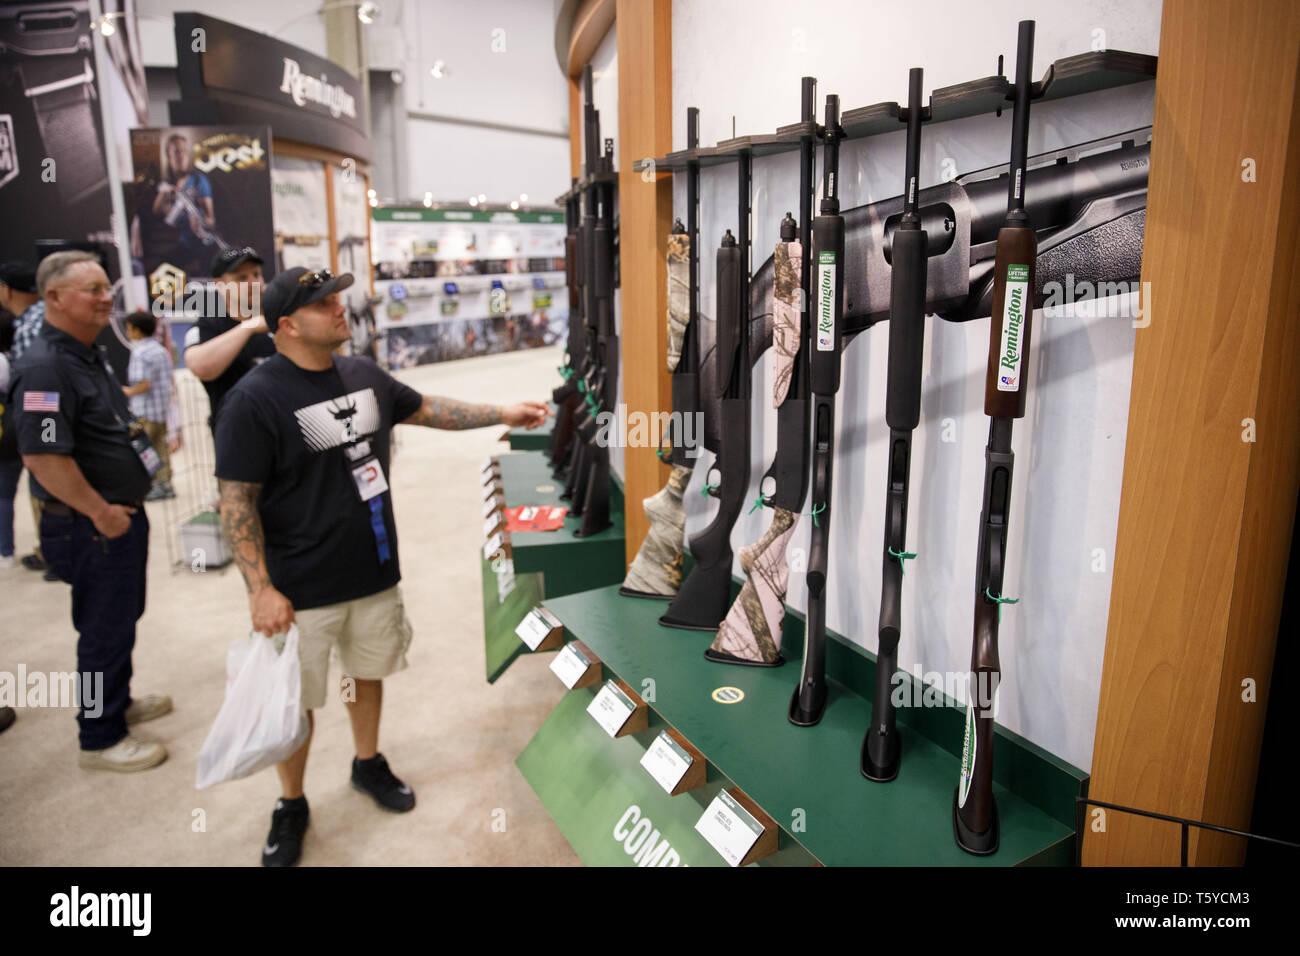 Remington Rifle Stock Photos & Remington Rifle Stock Images - Alamy